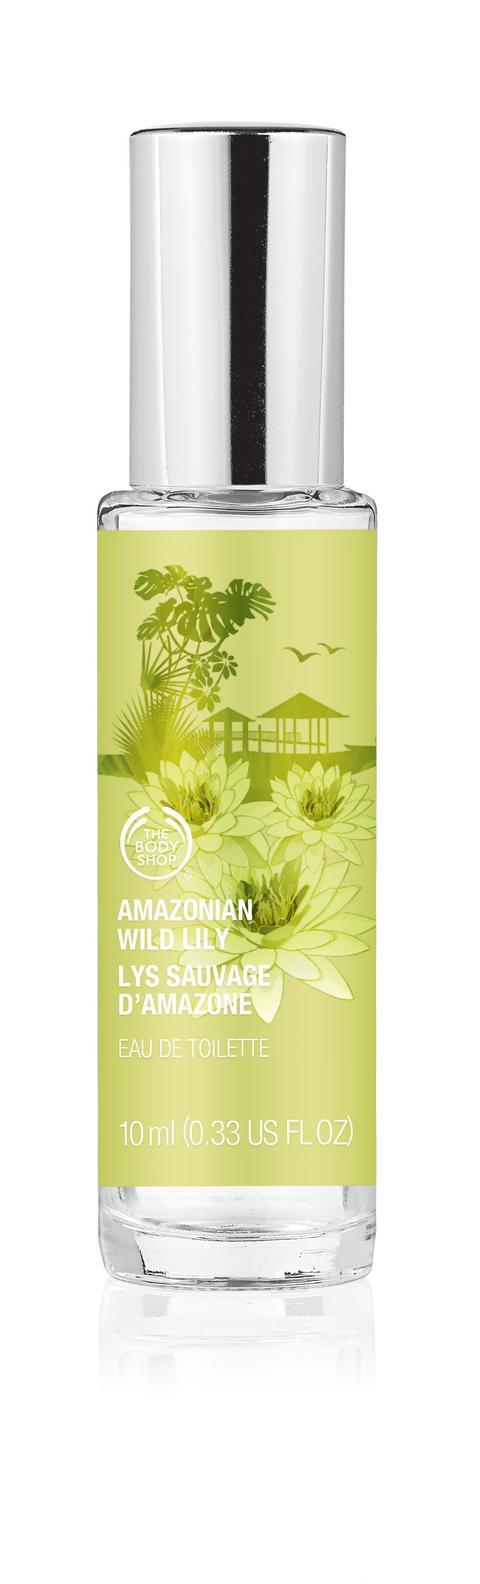 Amazonian Wild Lily Mini EdT